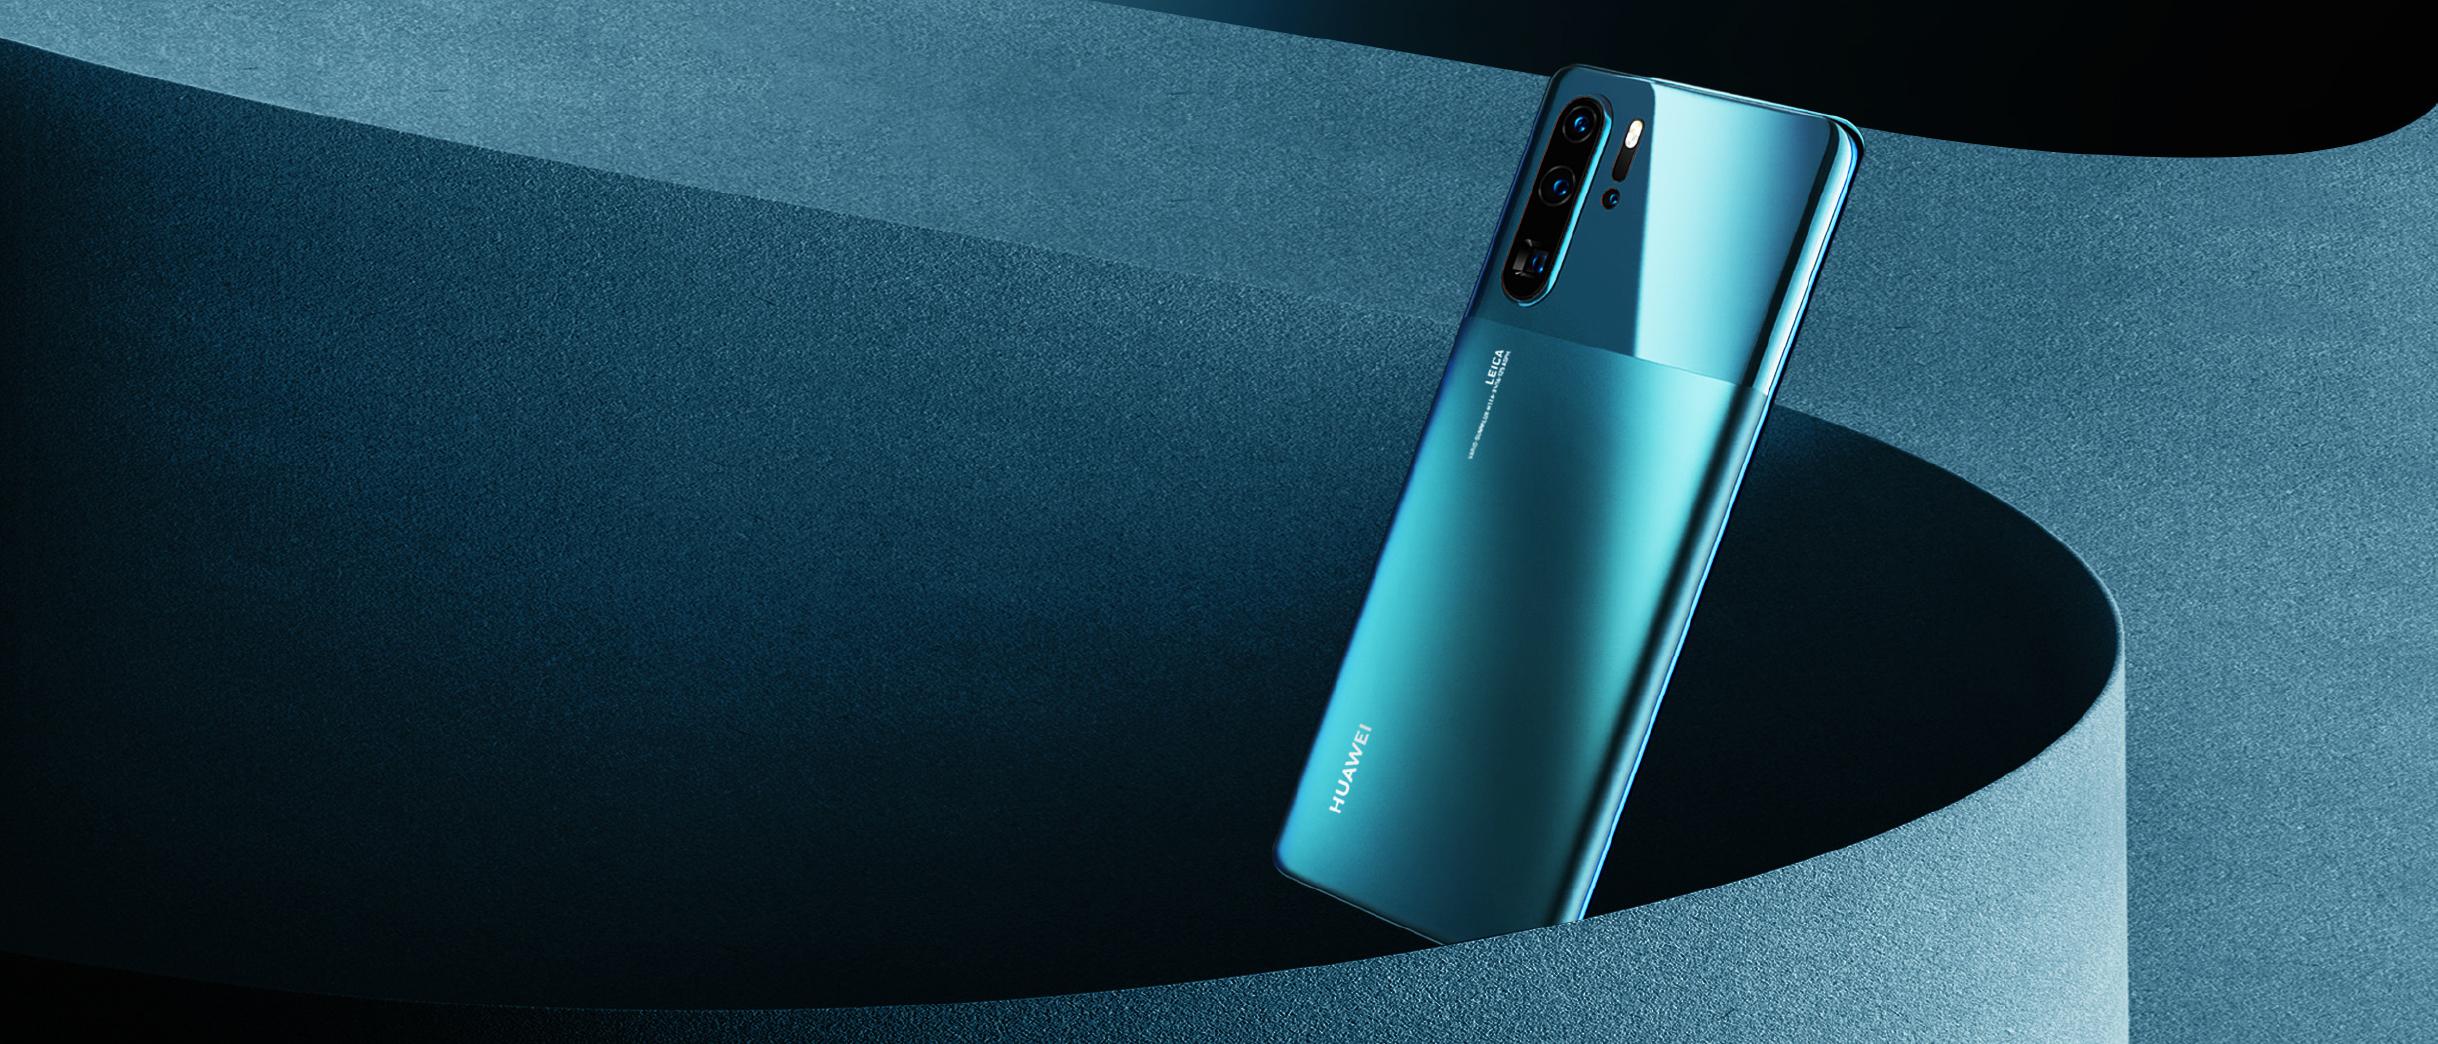 Huawei P30 Pro (Mystic Blue)